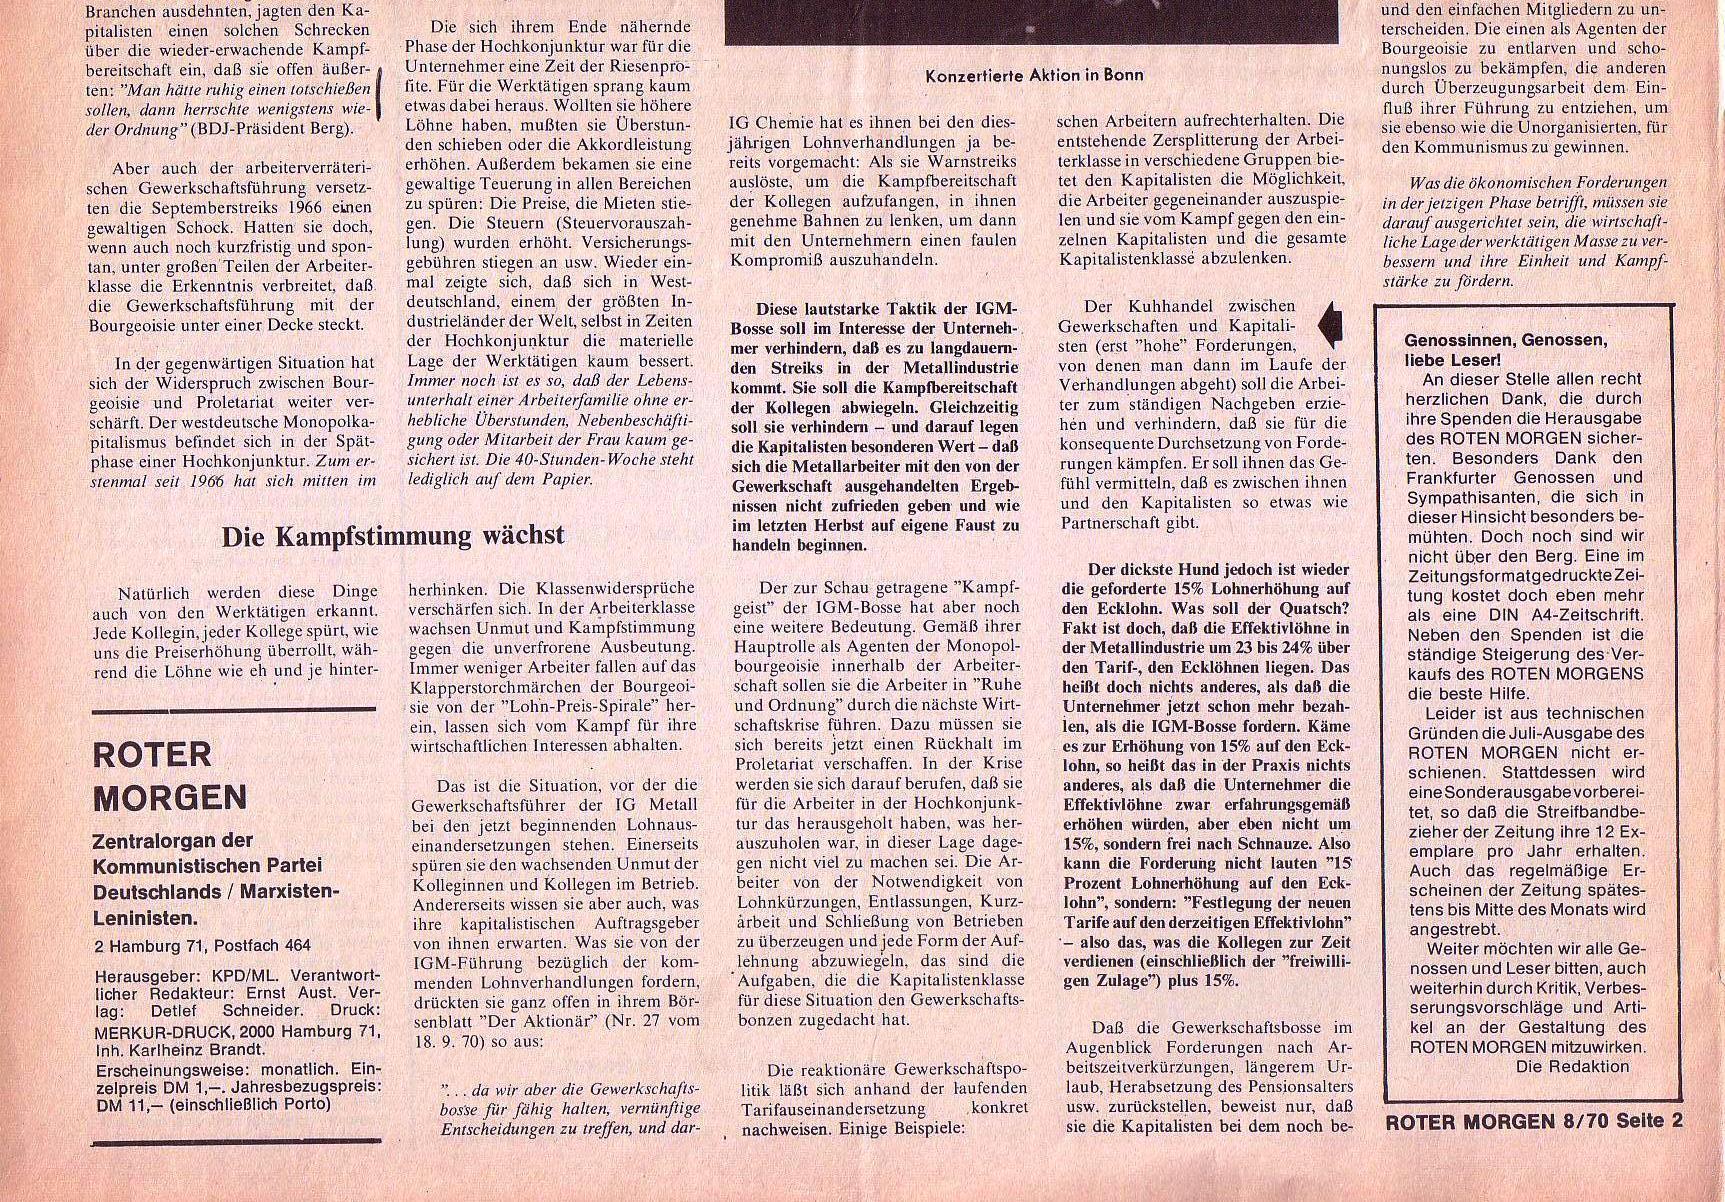 Roter Morgen, 4. Jg., September 1970, Nr. 8, Seite 2b